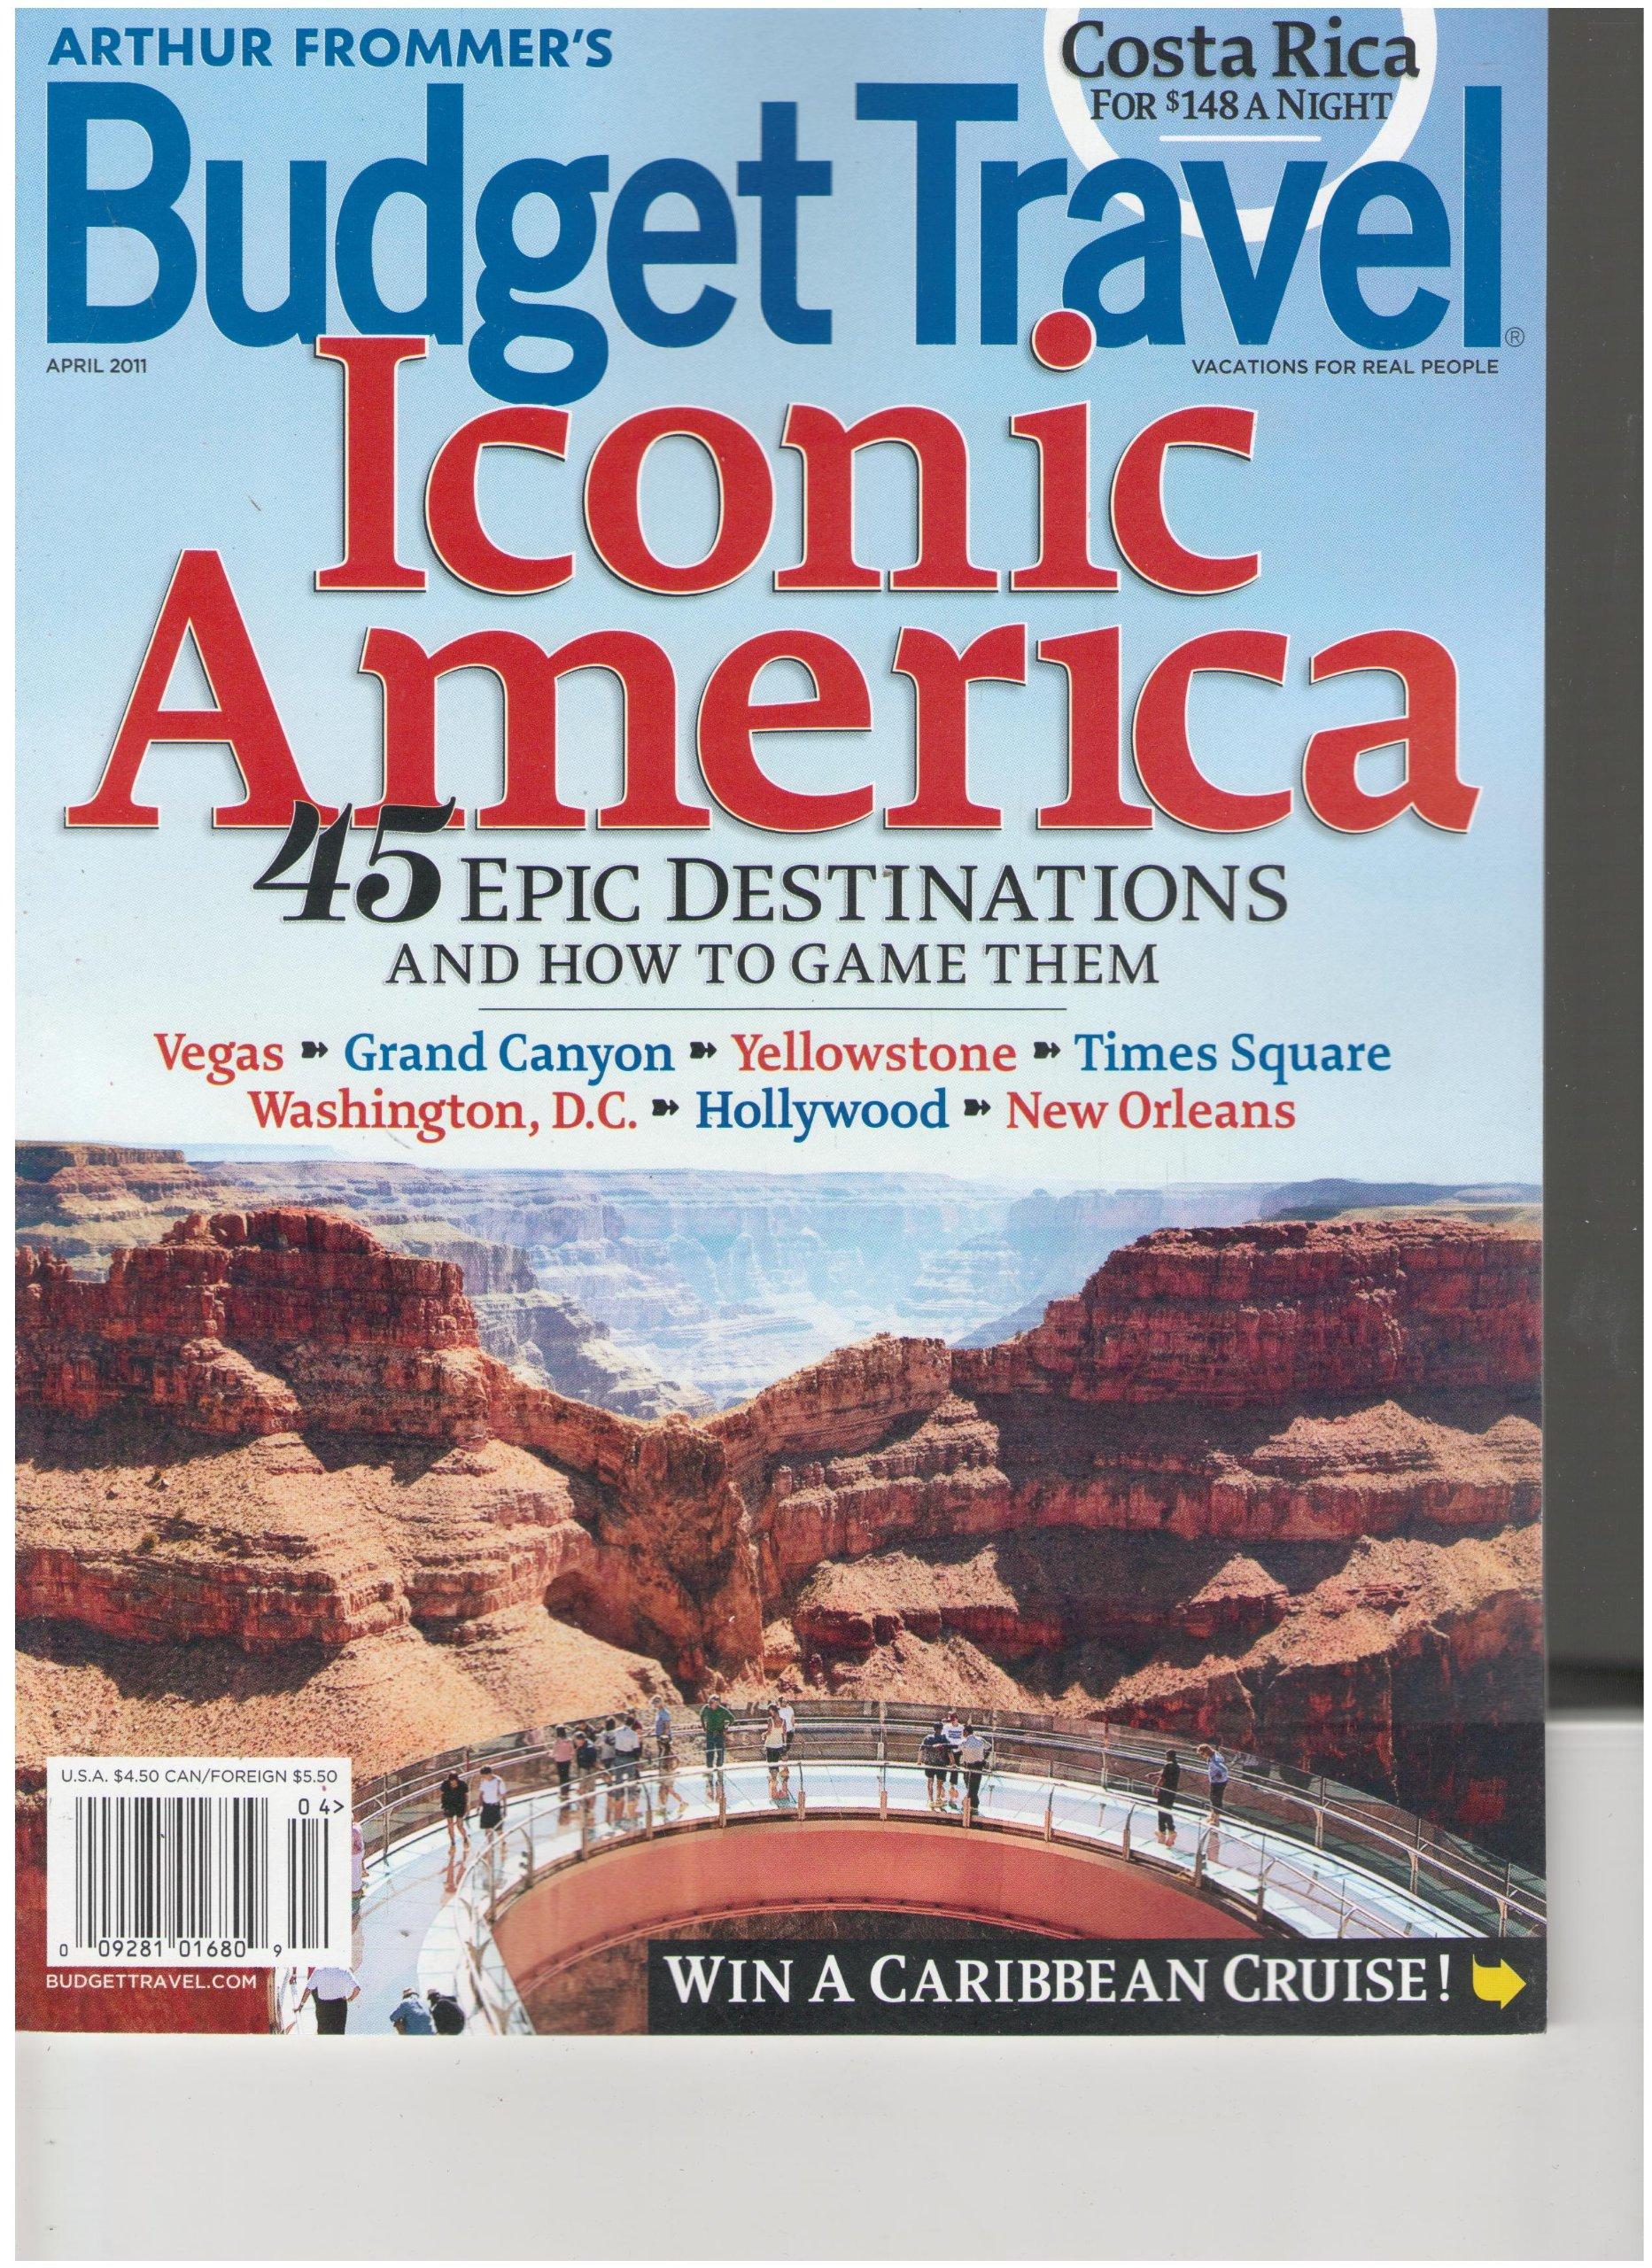 Budget Travel Magazine Iconic America April 2011 Various Amazon Com Books